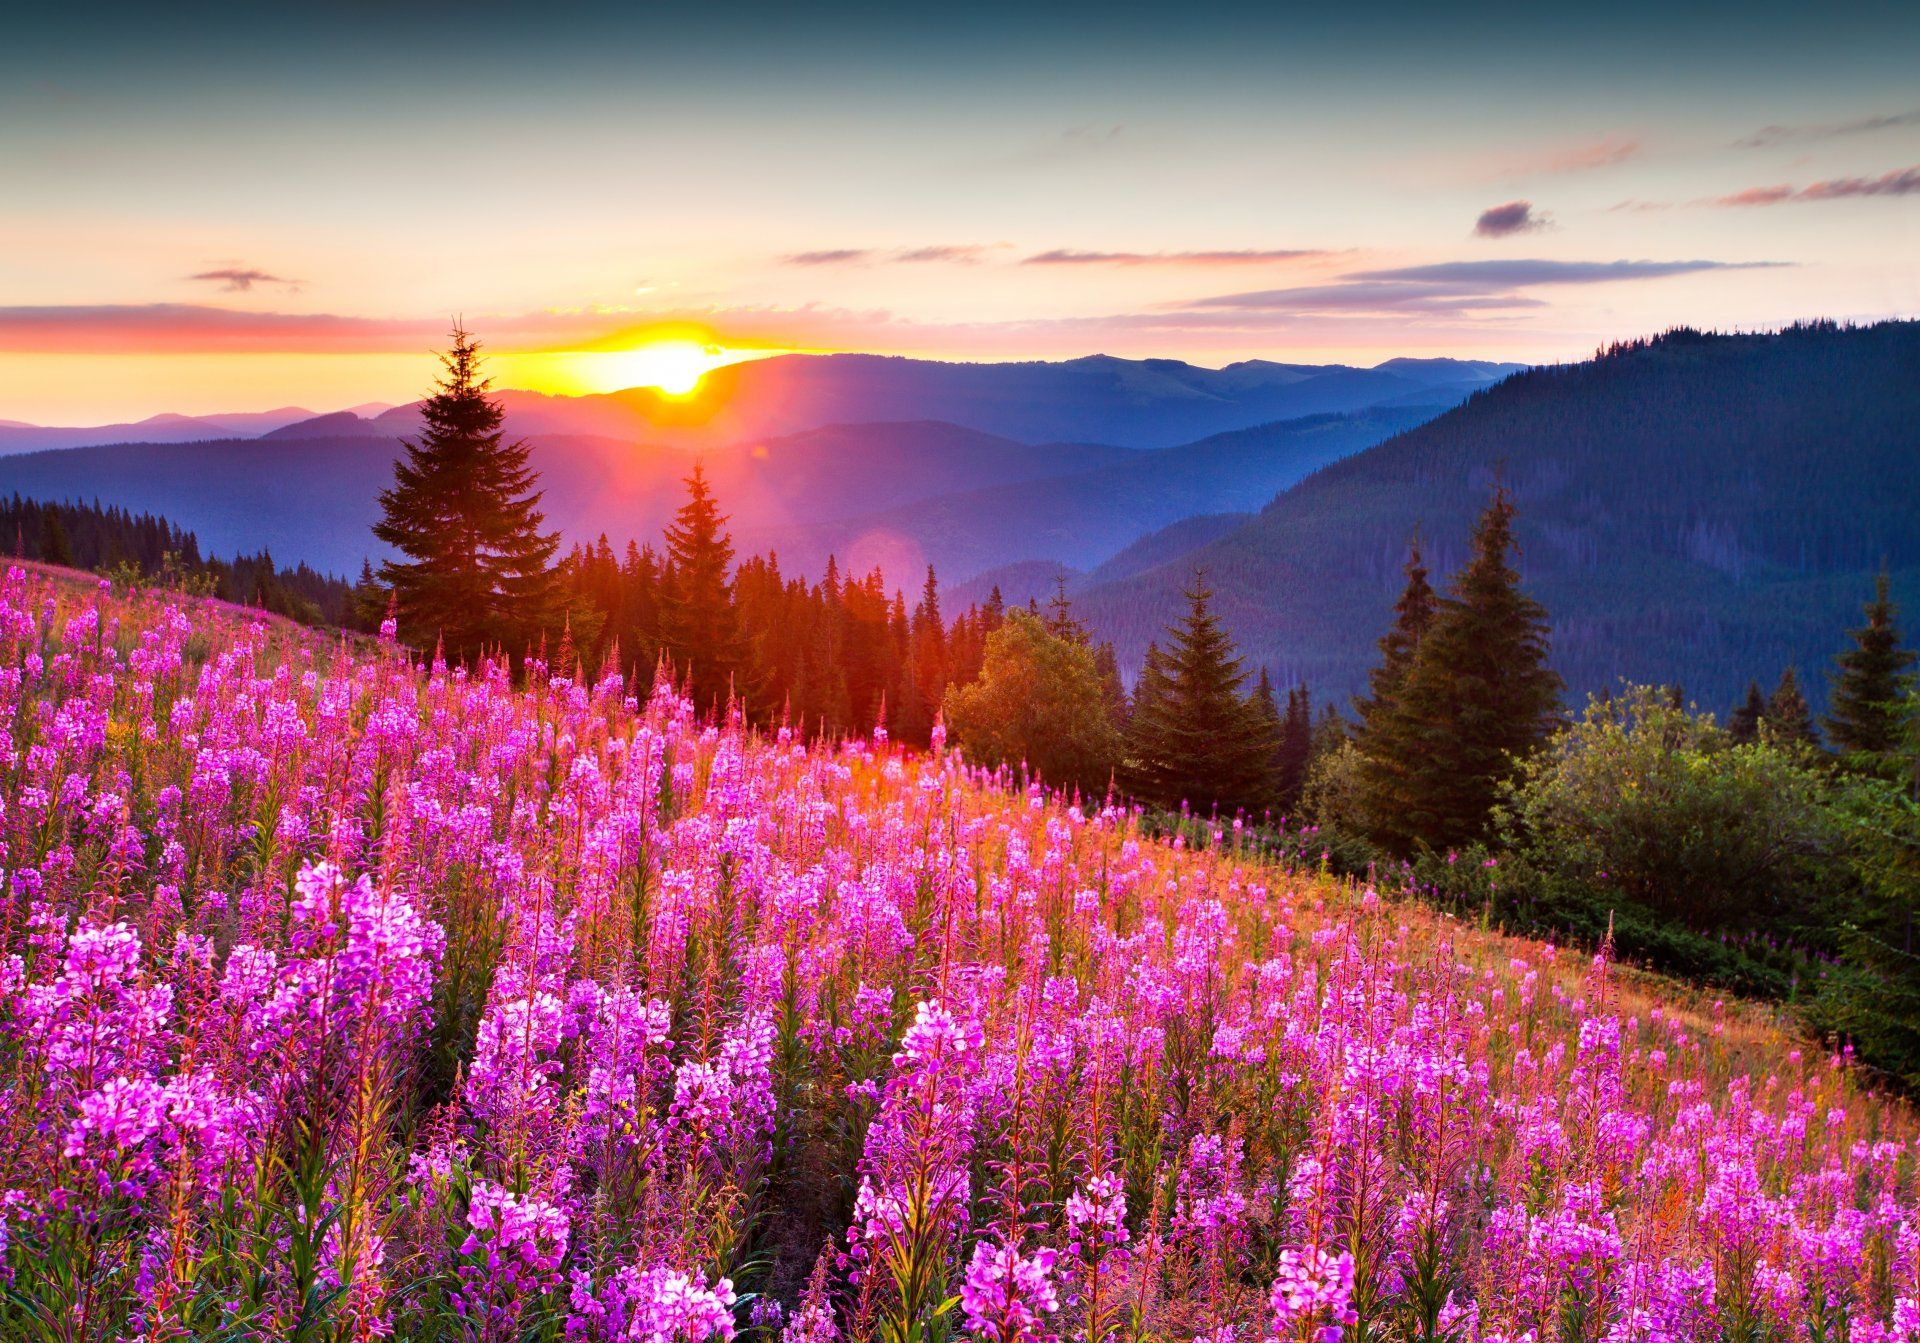 Priroda Gory Leto Svet Solnca Les Cvety Foto Pozitiv Krasivo Hd